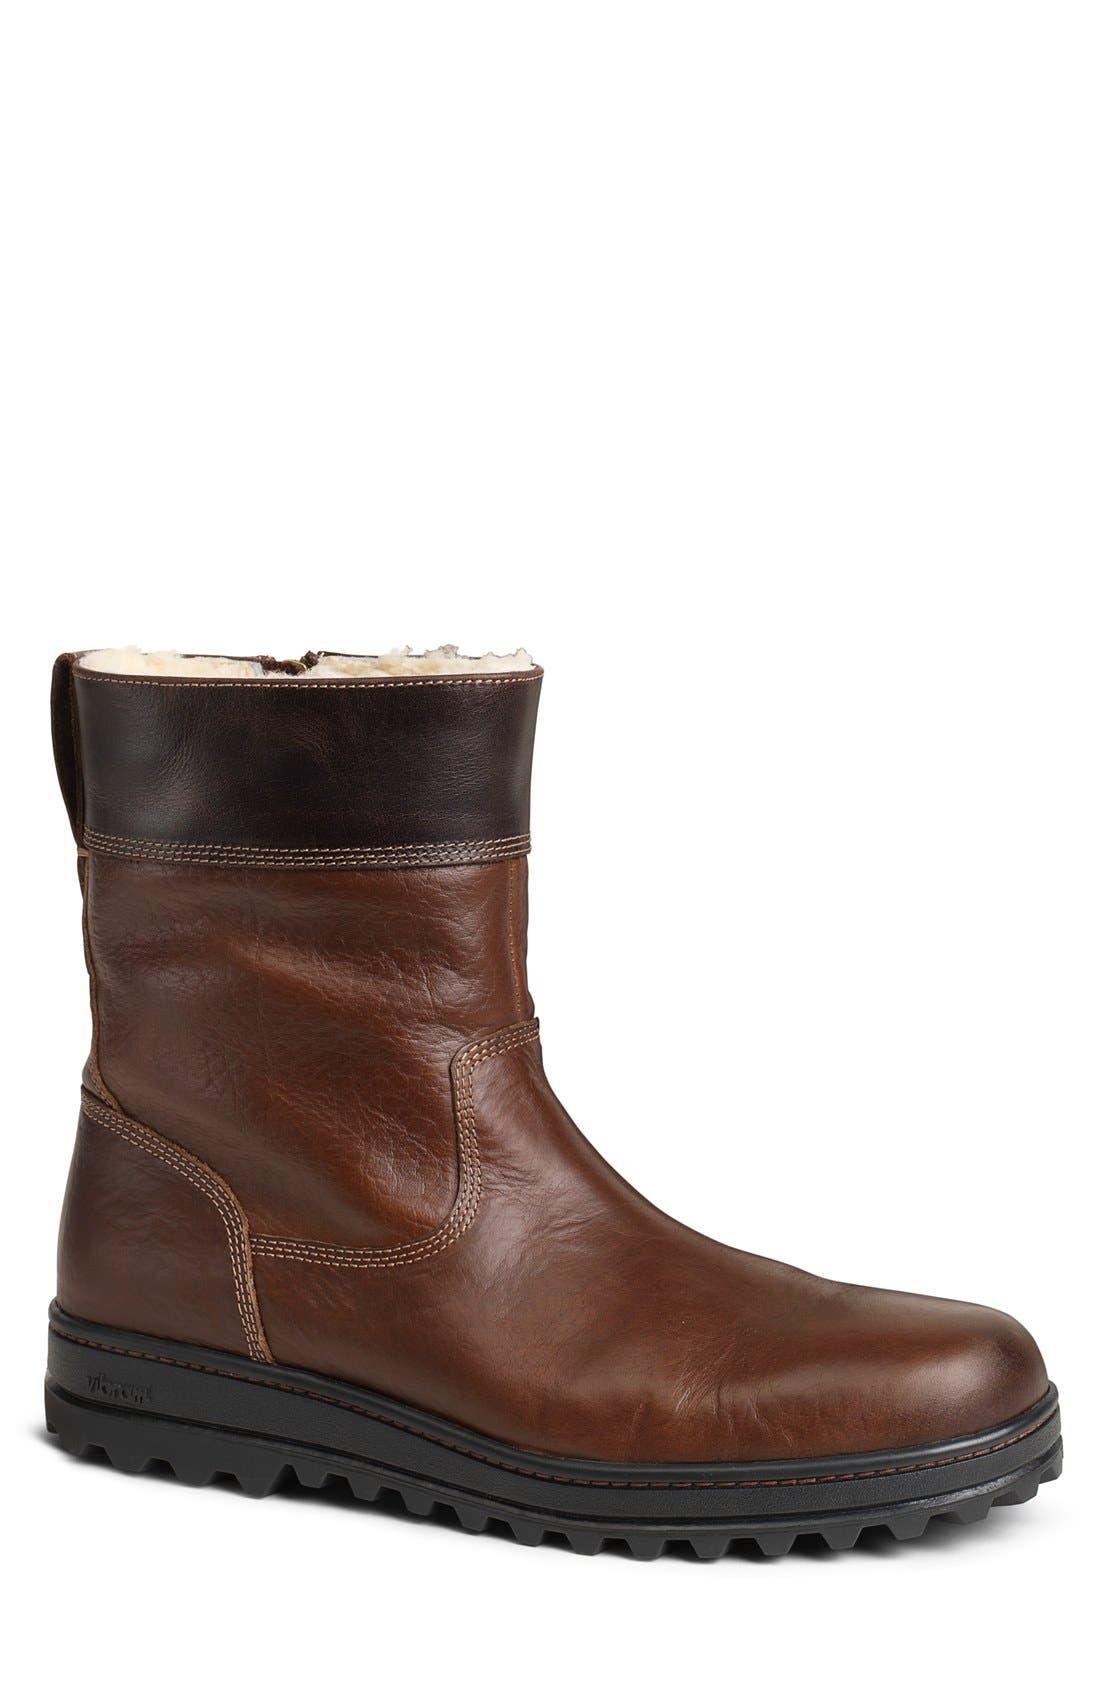 Main Image - Trask 'Winslow' Plain Toe Boot (Men)